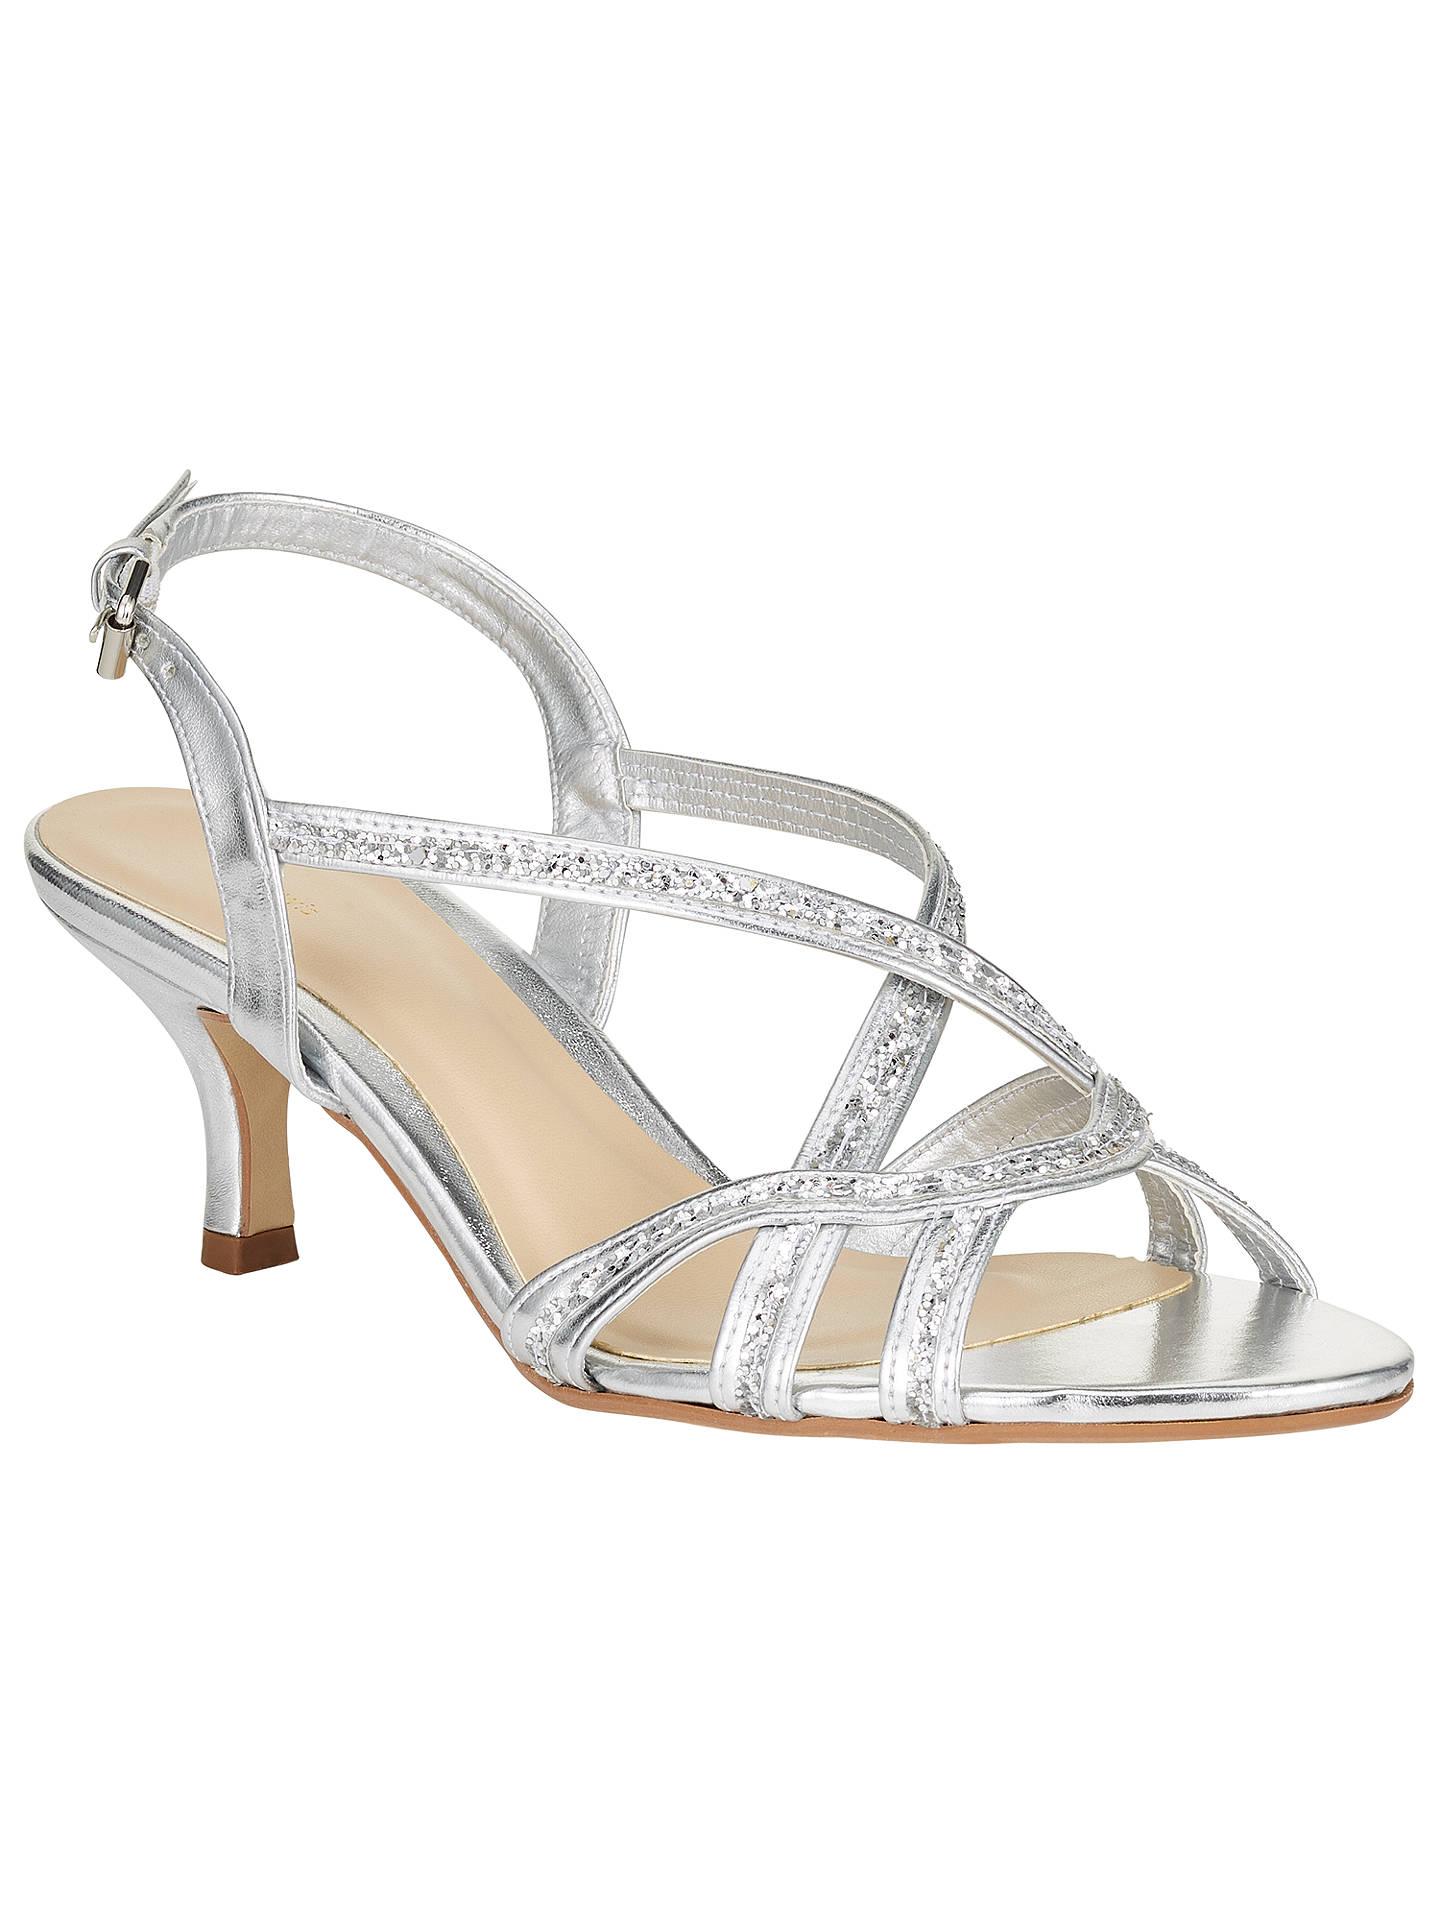 51422b52f89 John Lewis New Glamour Multi Strap Kitten Heeled Sandals at John ...